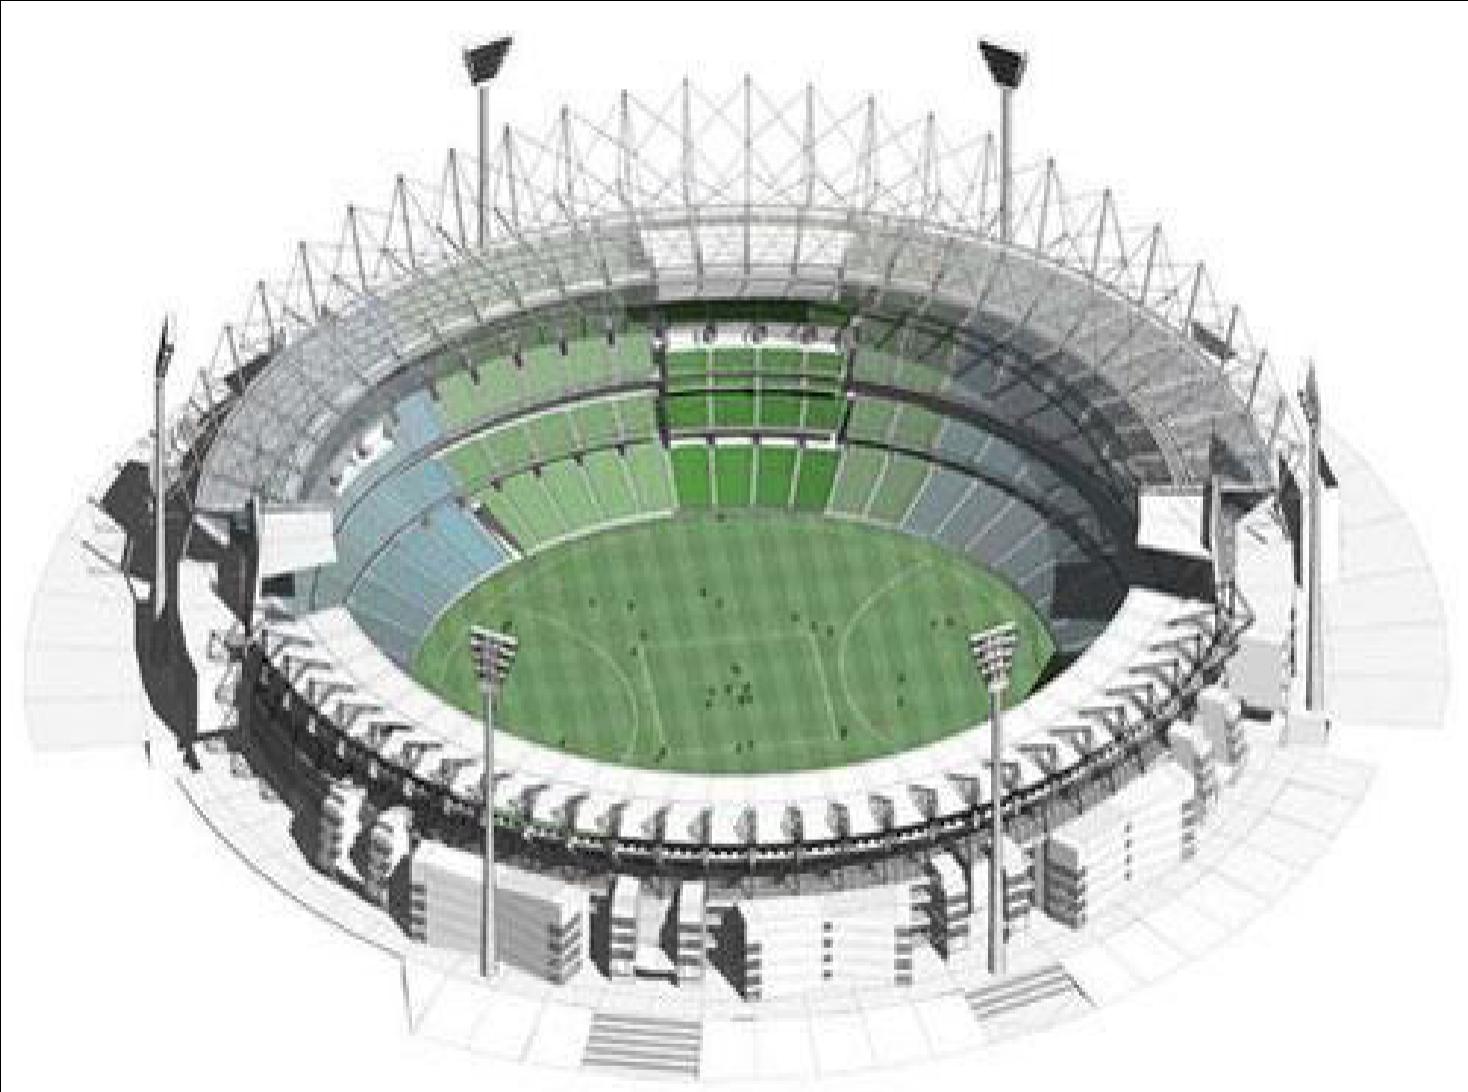 Modeling Stadium internal and external flows